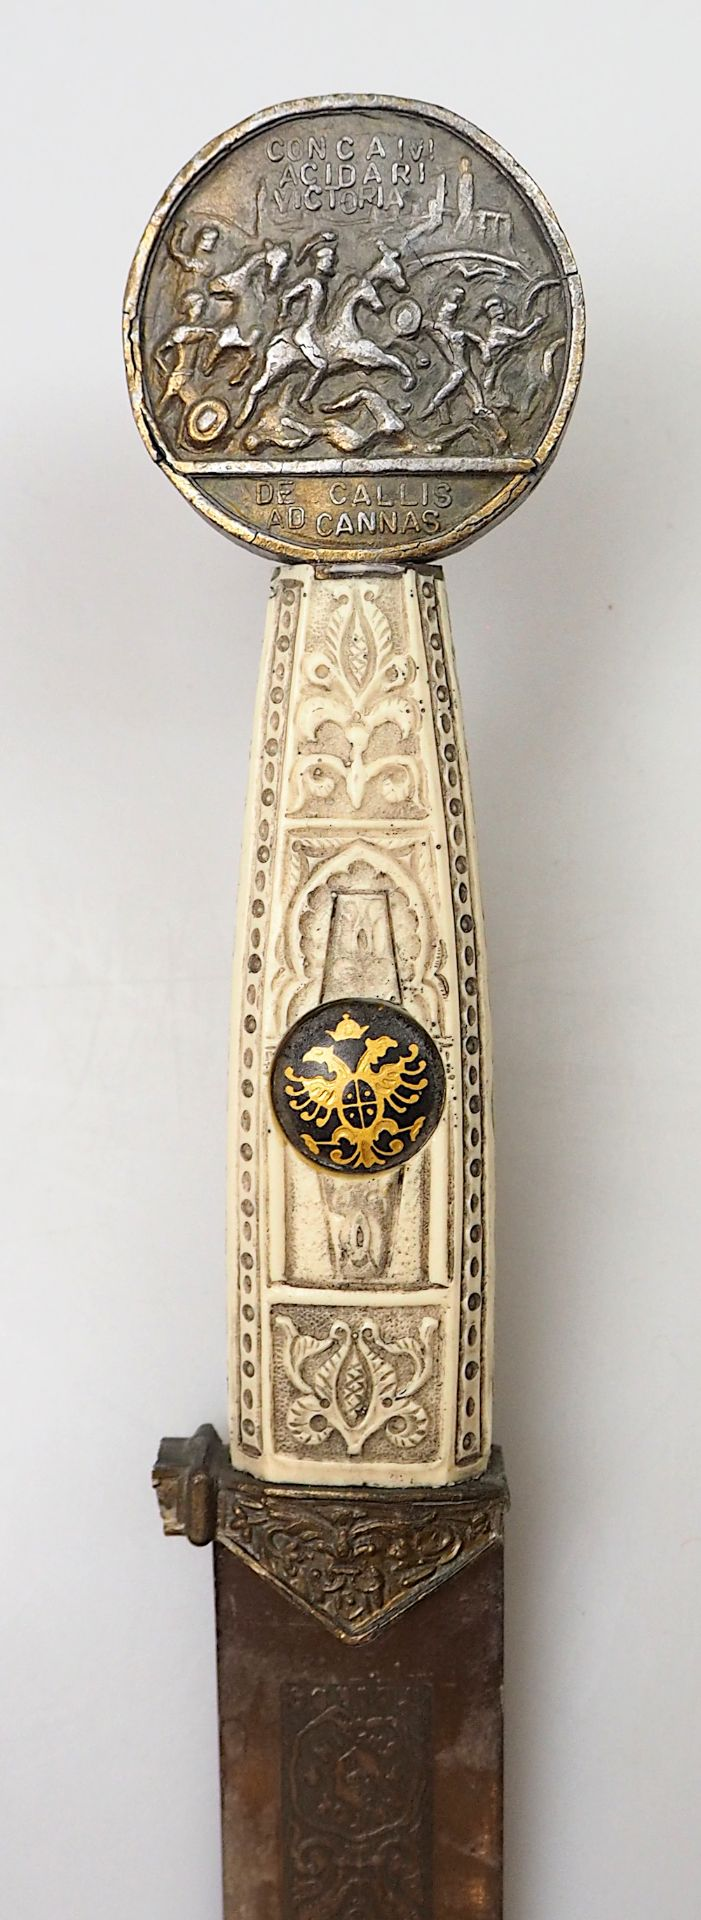 1 Bajonette wohl Anfang 20. Jh. mit Holzgriff L ca. 51,5cm sowie 1 Konv. Waffenreplike - Bild 3 aus 7